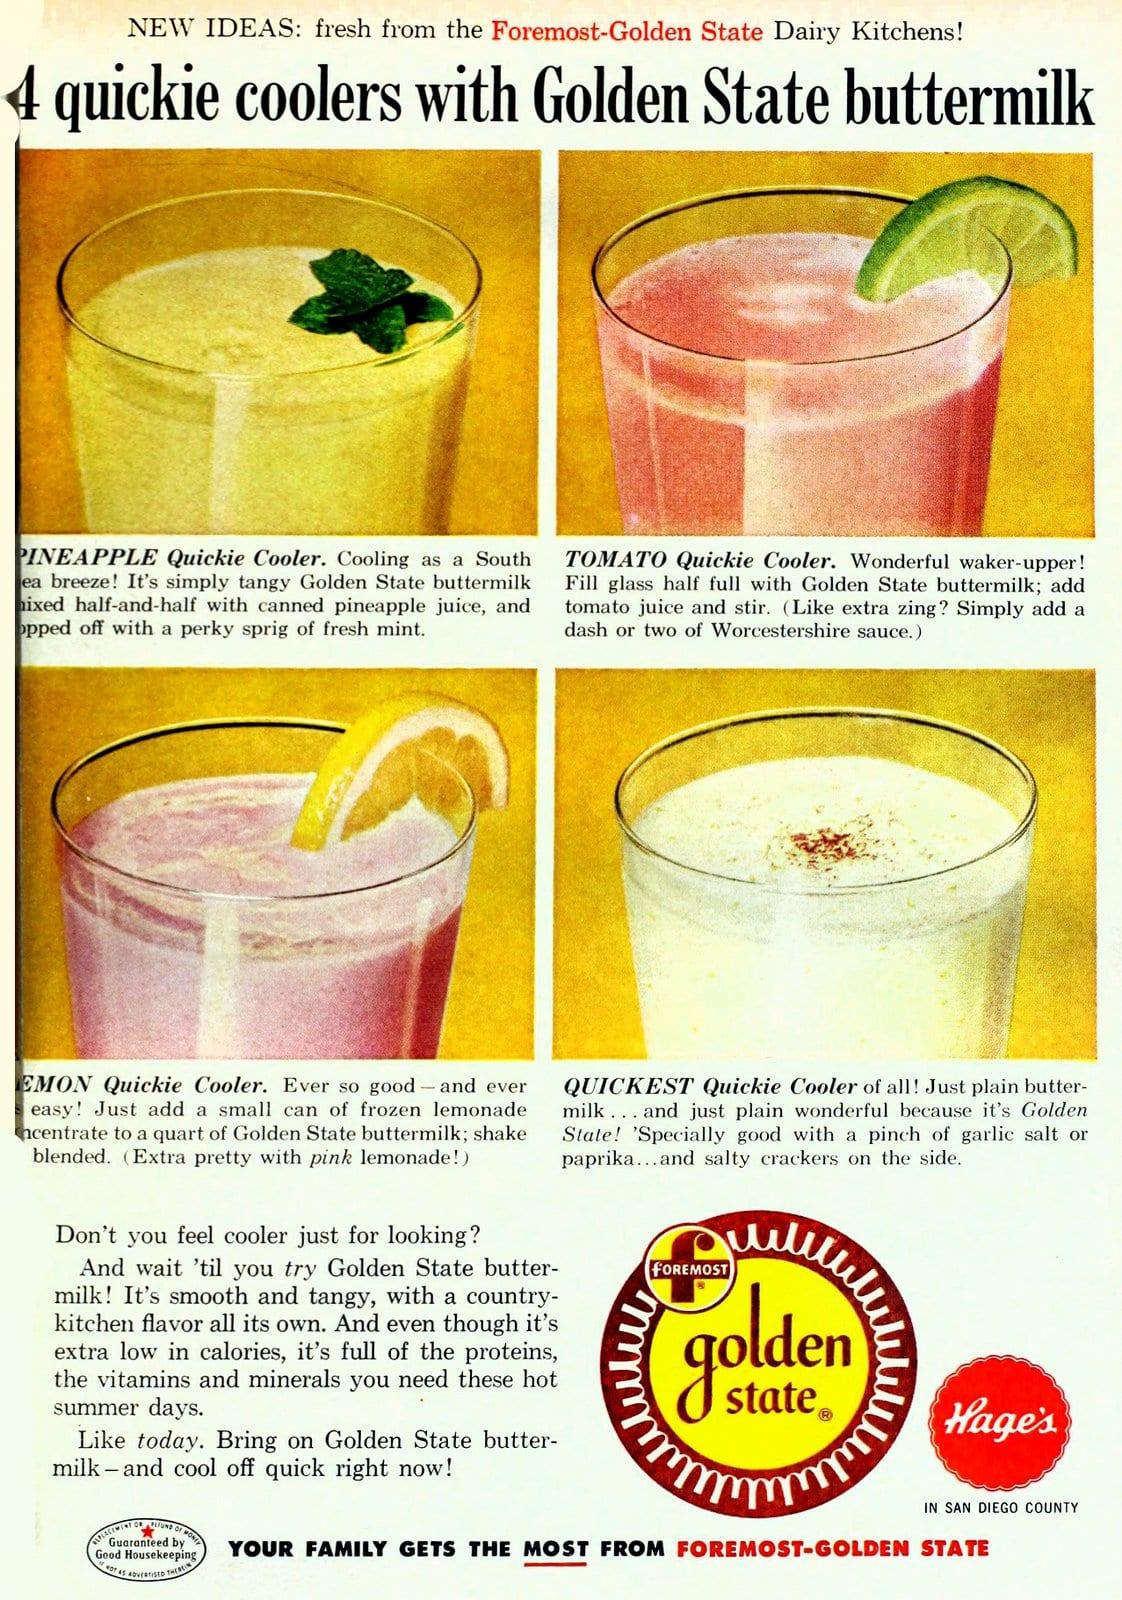 4 quickie buttermilk cooler recipes (1958)